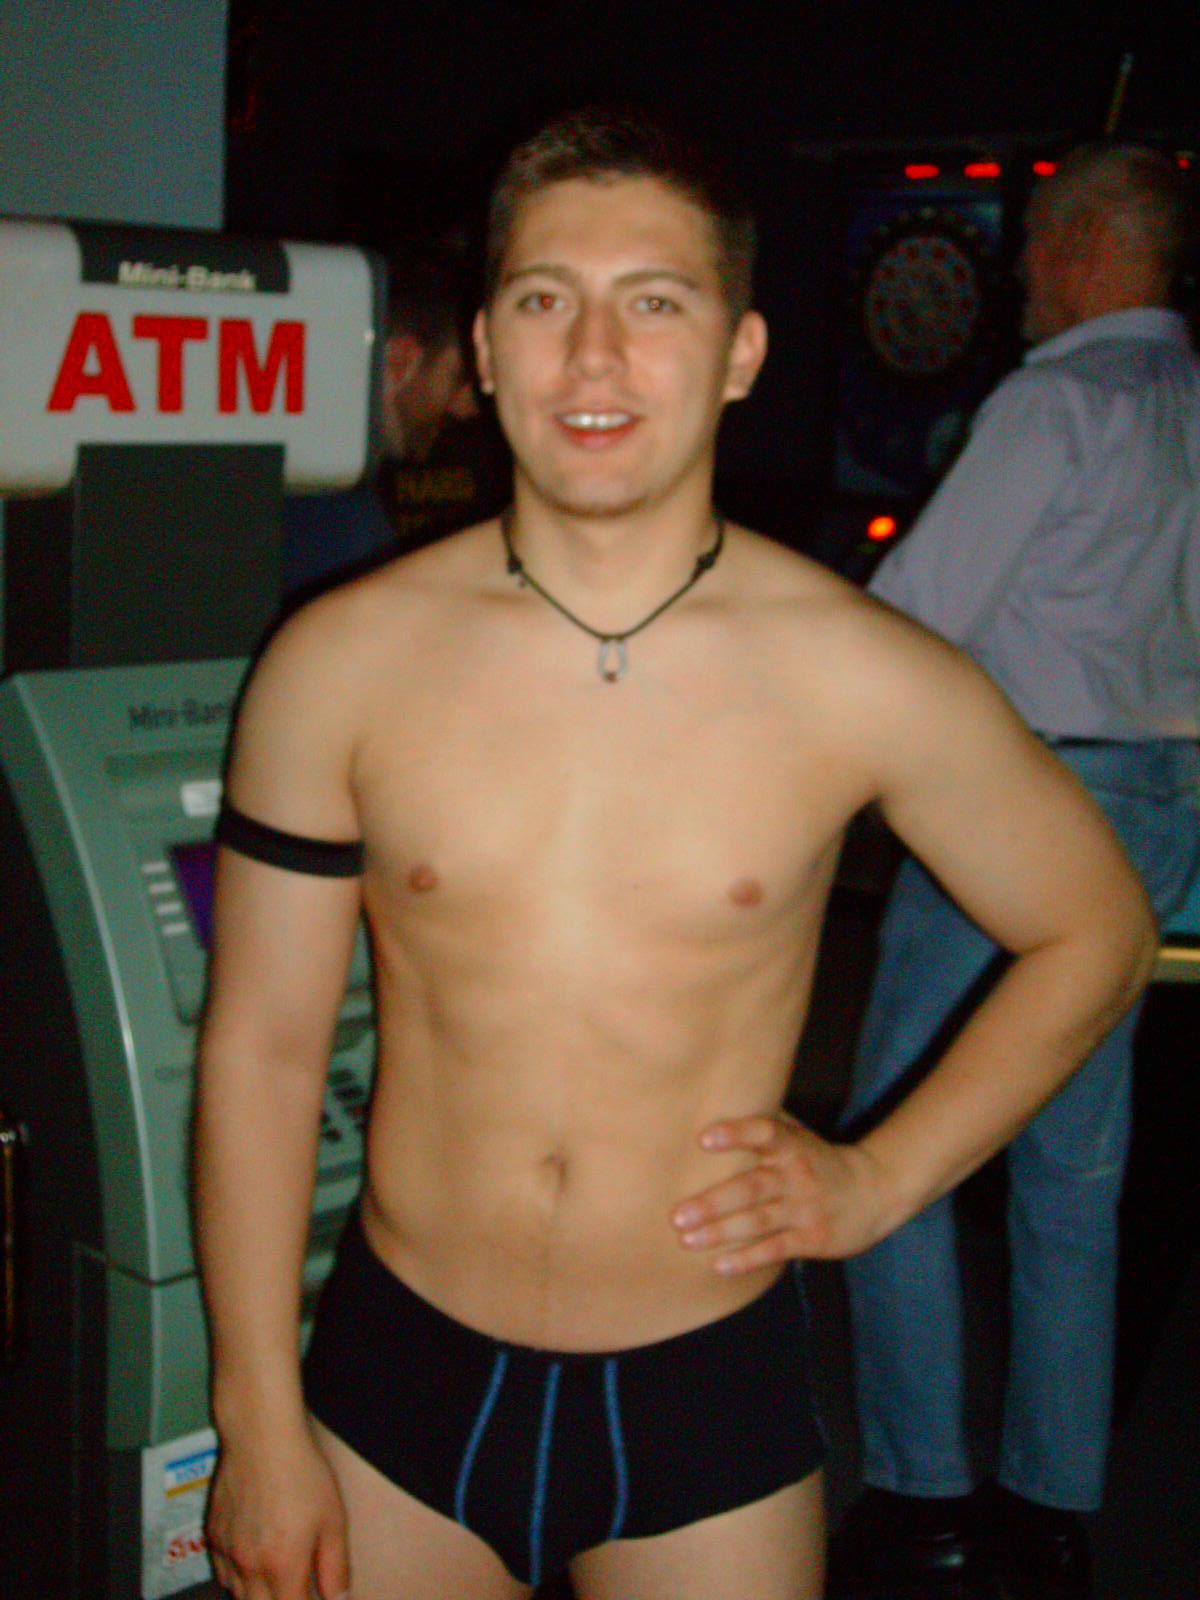 gay male pleasuring self